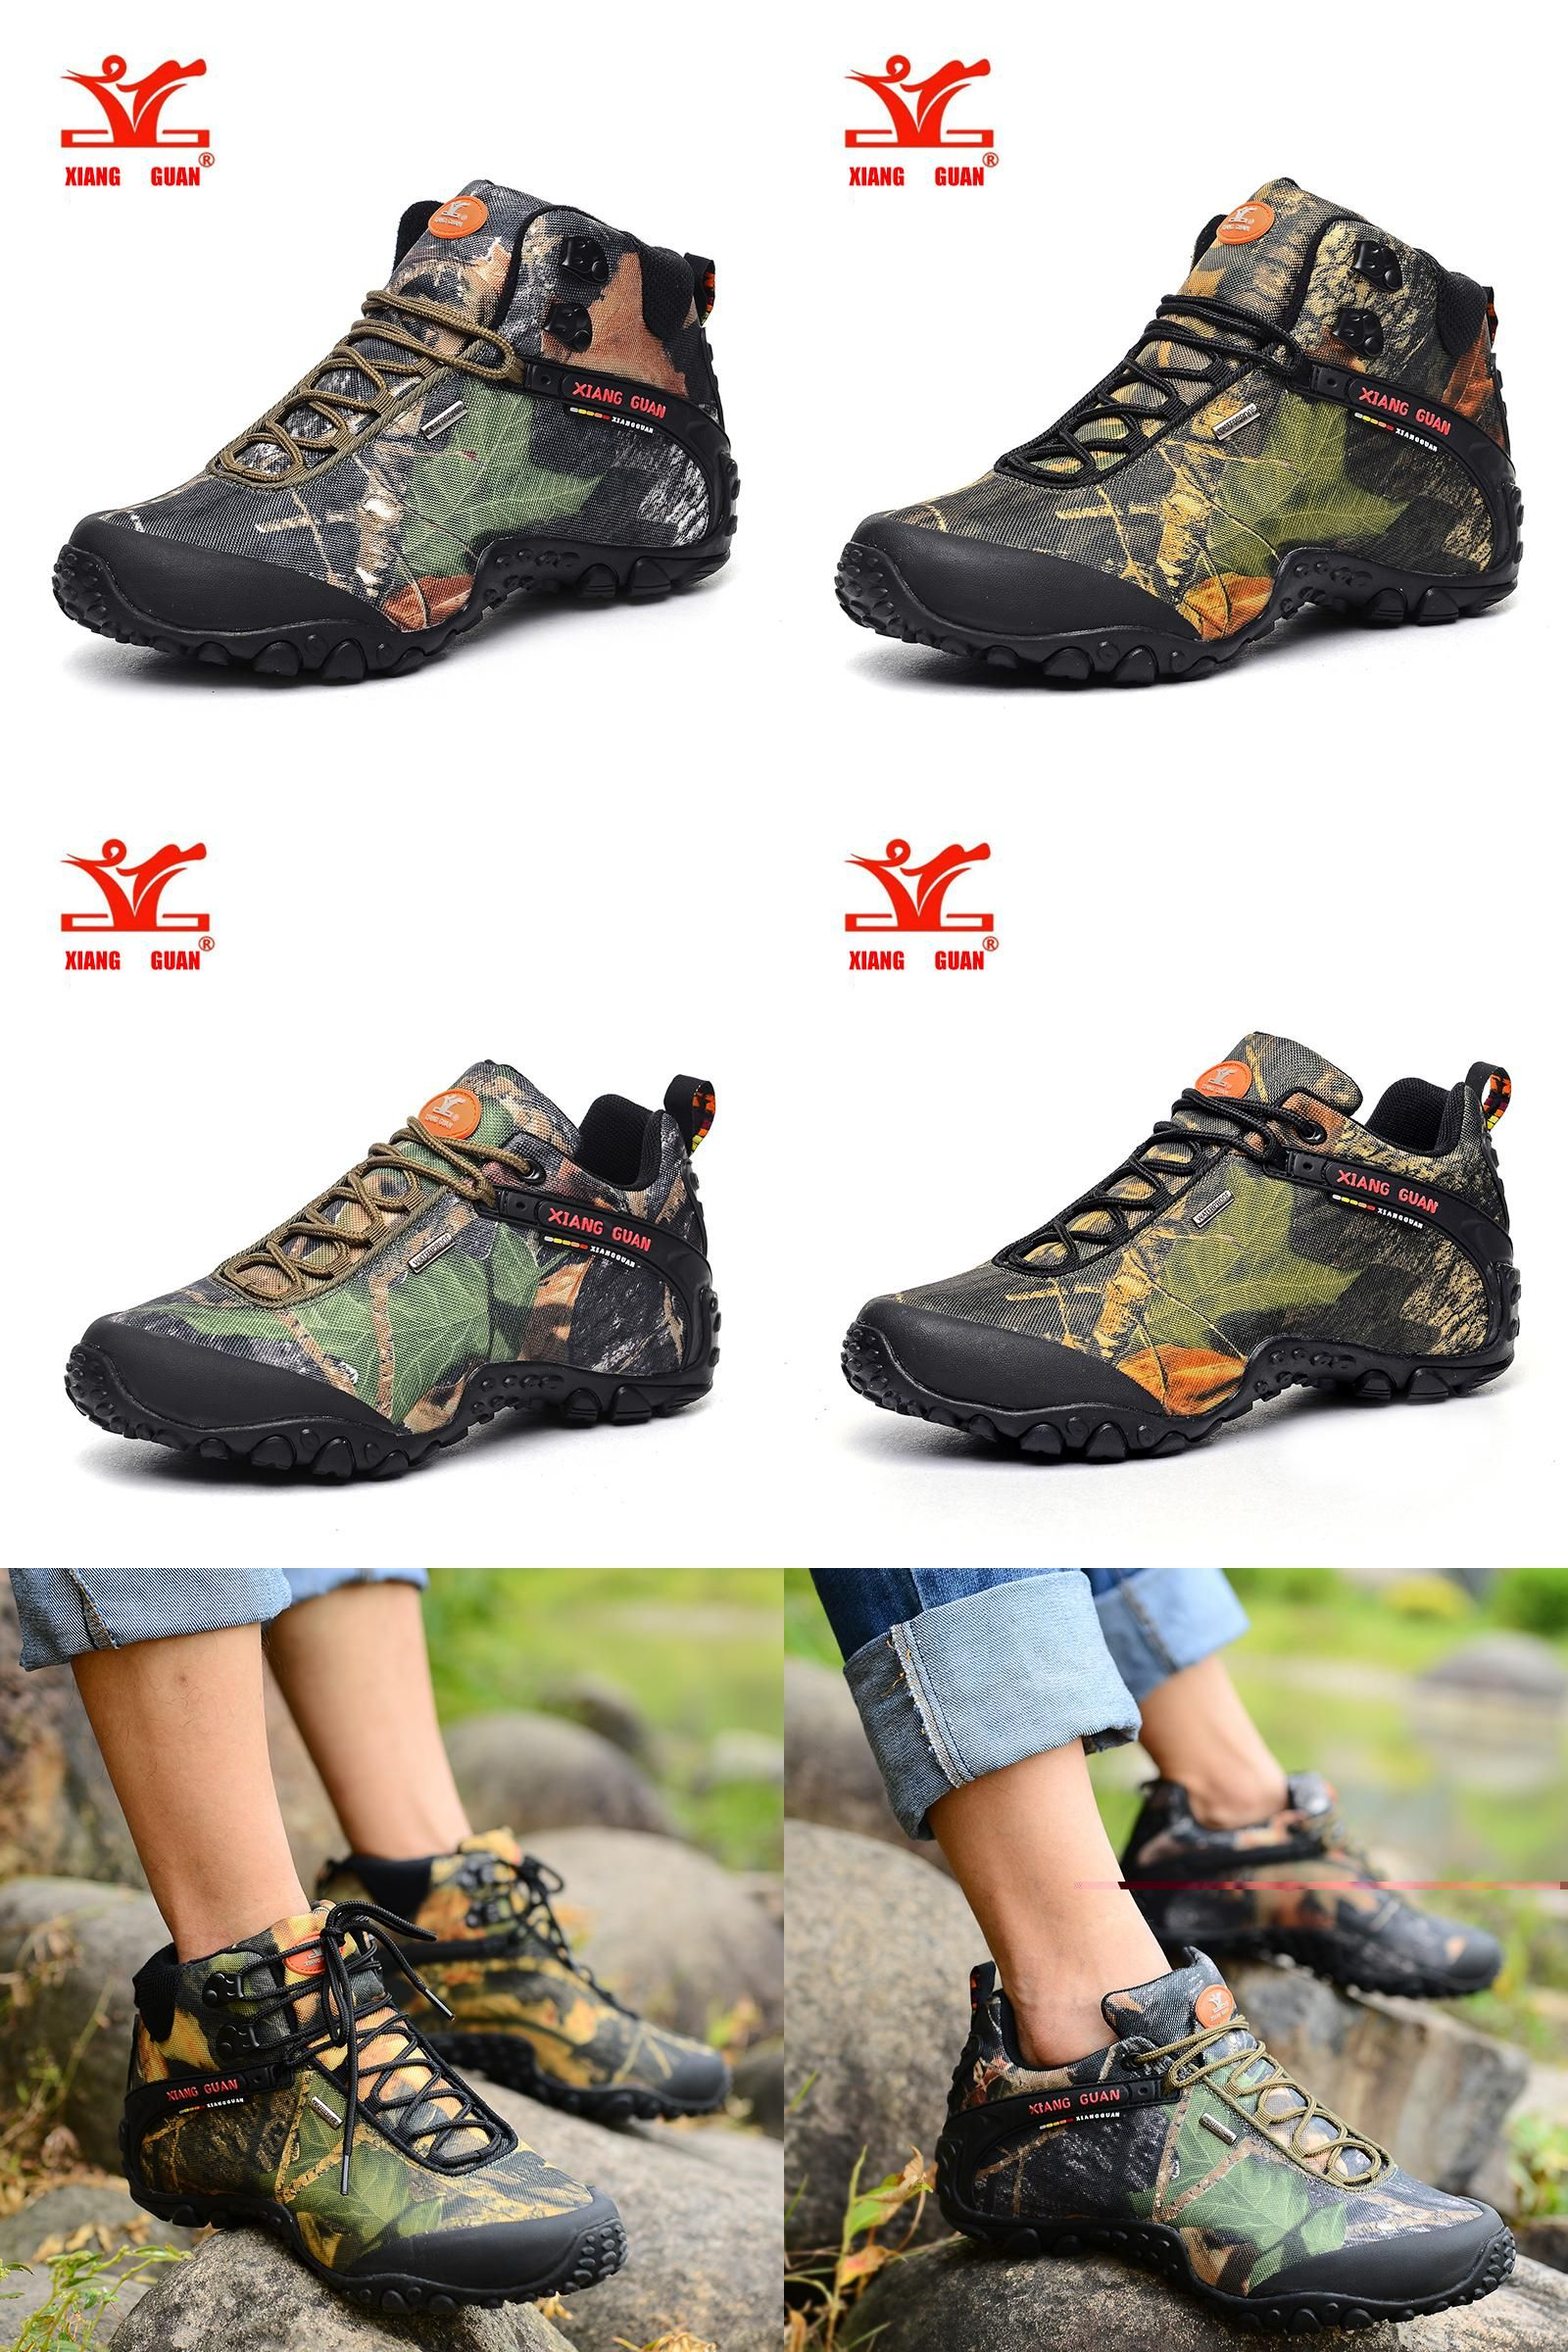 [Visit to Buy] XiangGuan brand men and women outdoor Hiking shoes  waterproof canvas sport